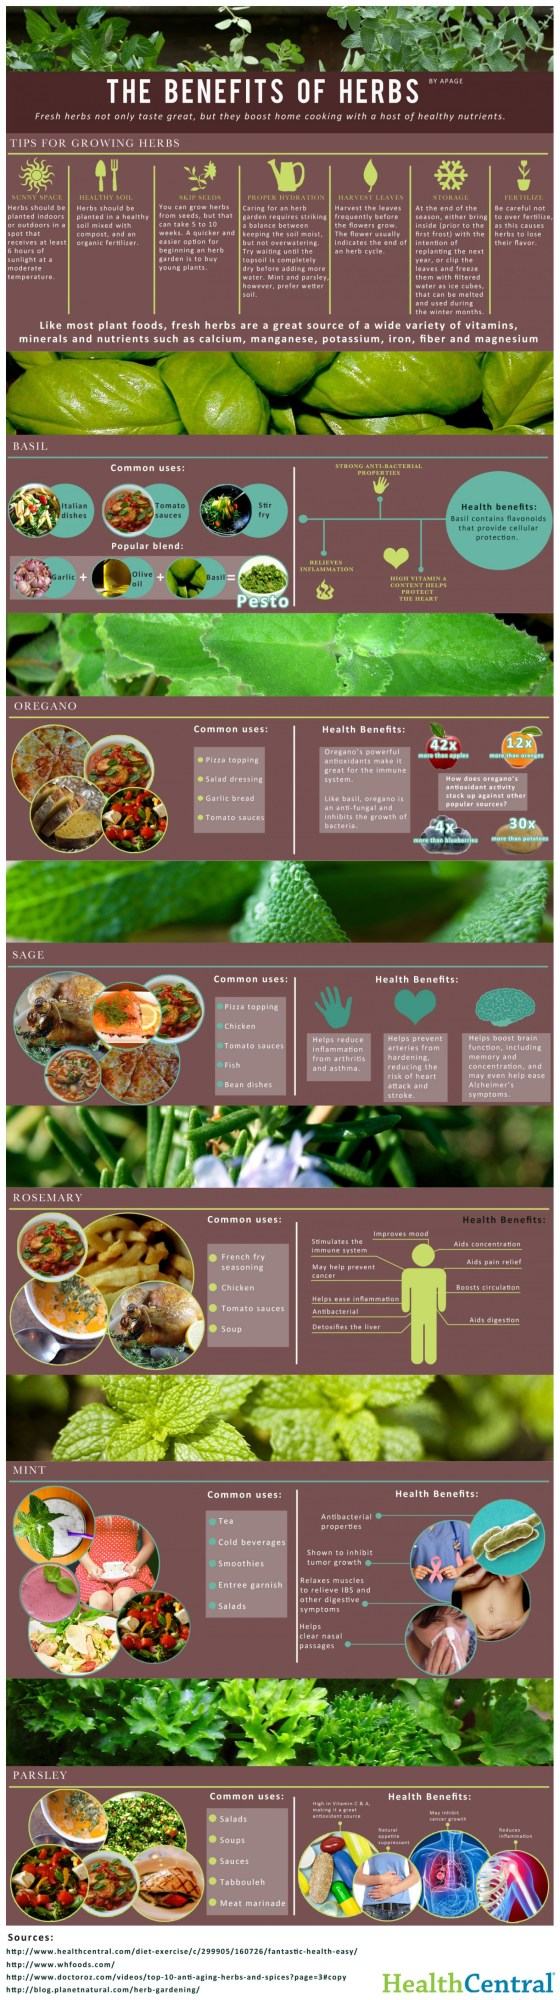 Photo credit: http://visual.ly/benefits-herbs